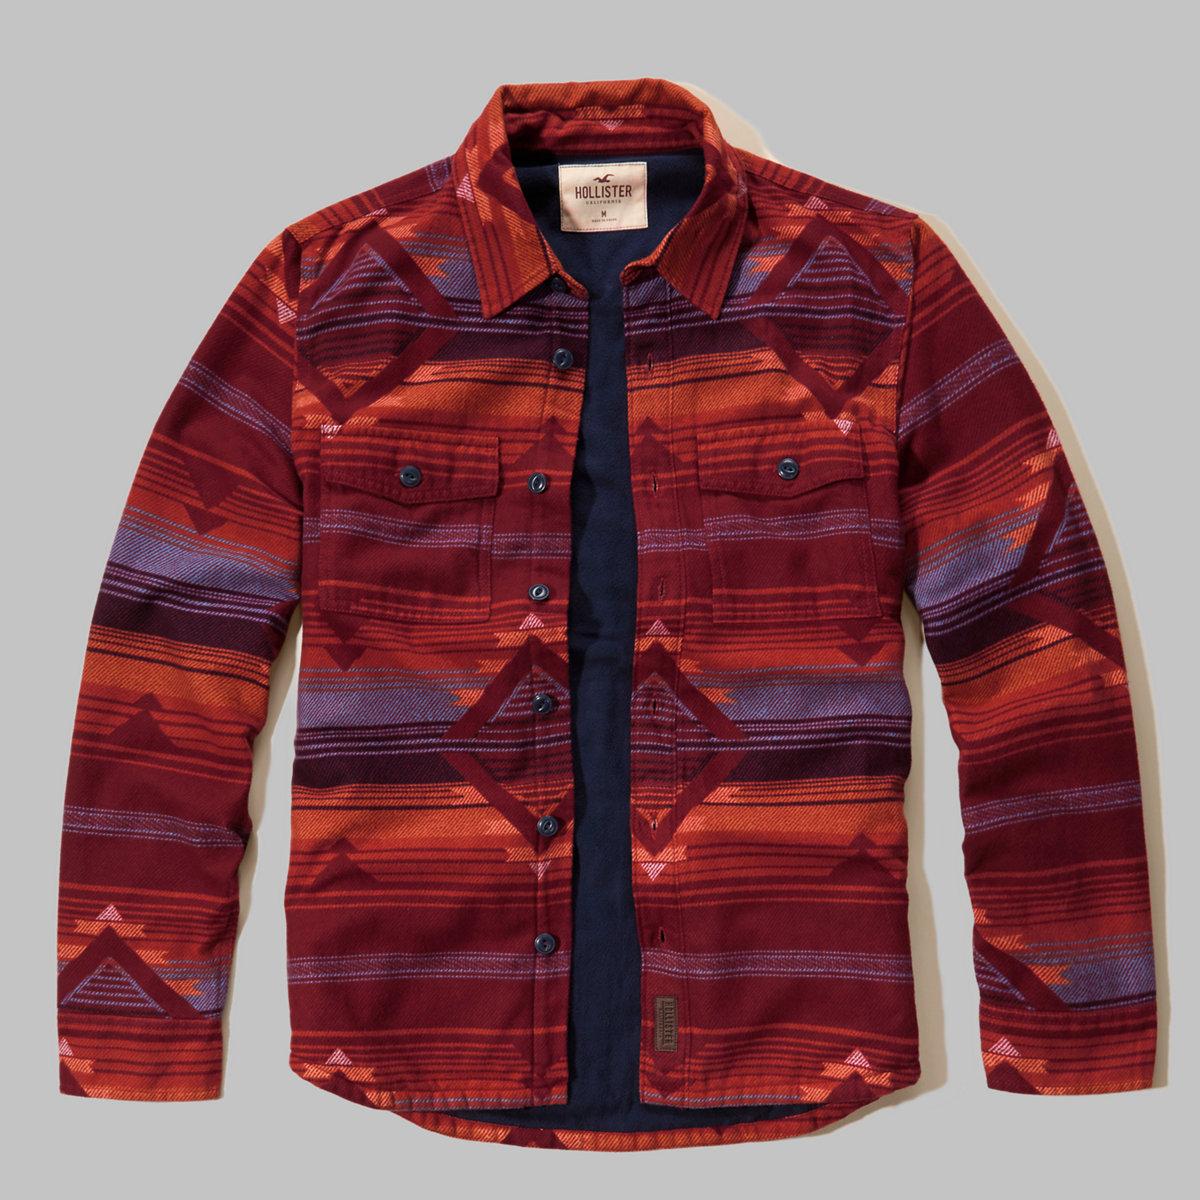 Patterned Thermal Fleece Shirt Jacket